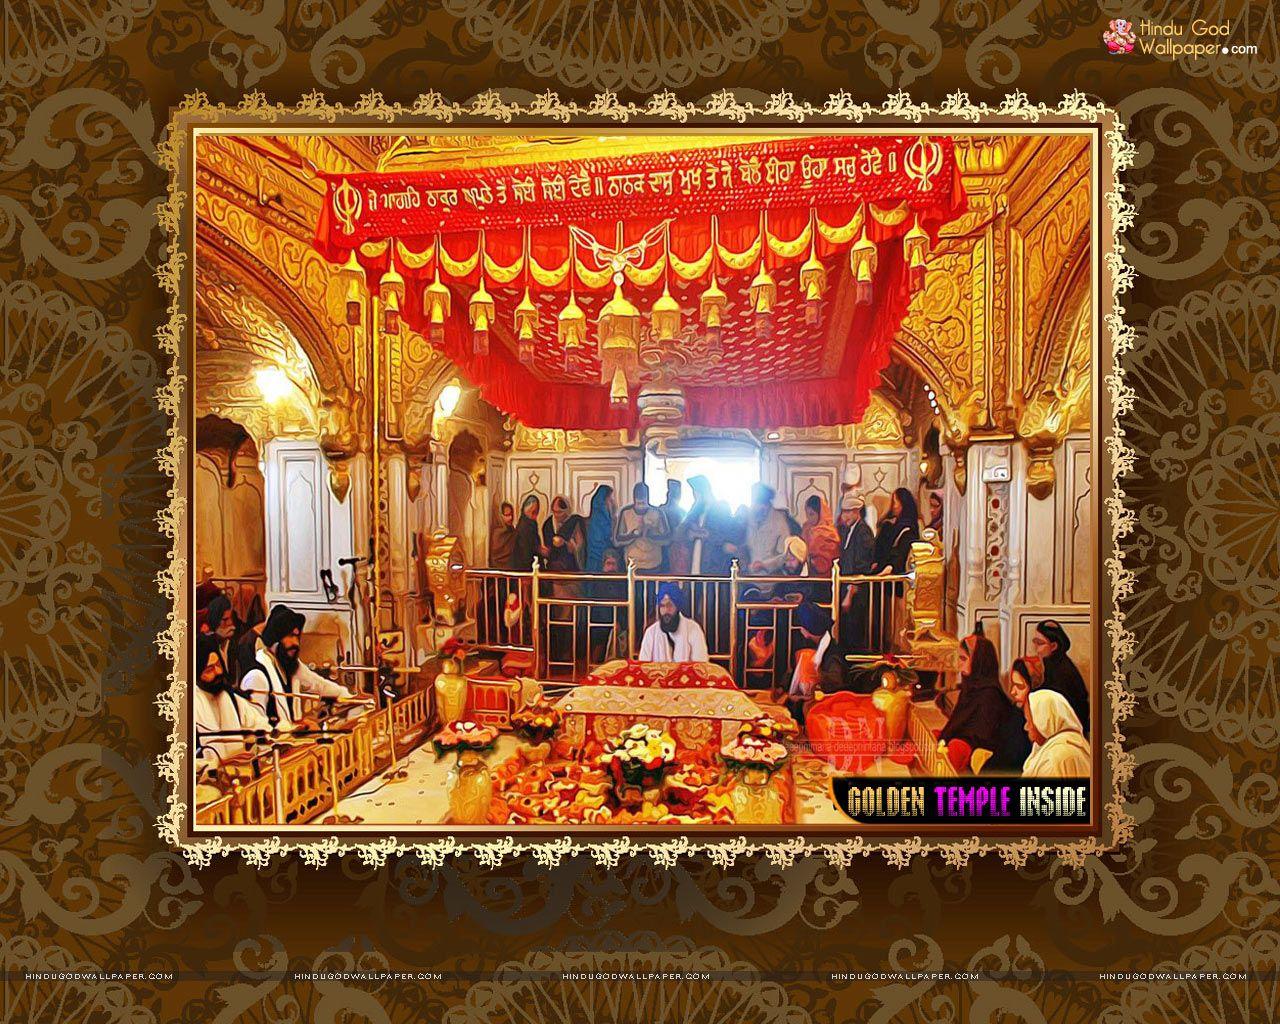 golden temple inside hd wallpaper free download | golden temple